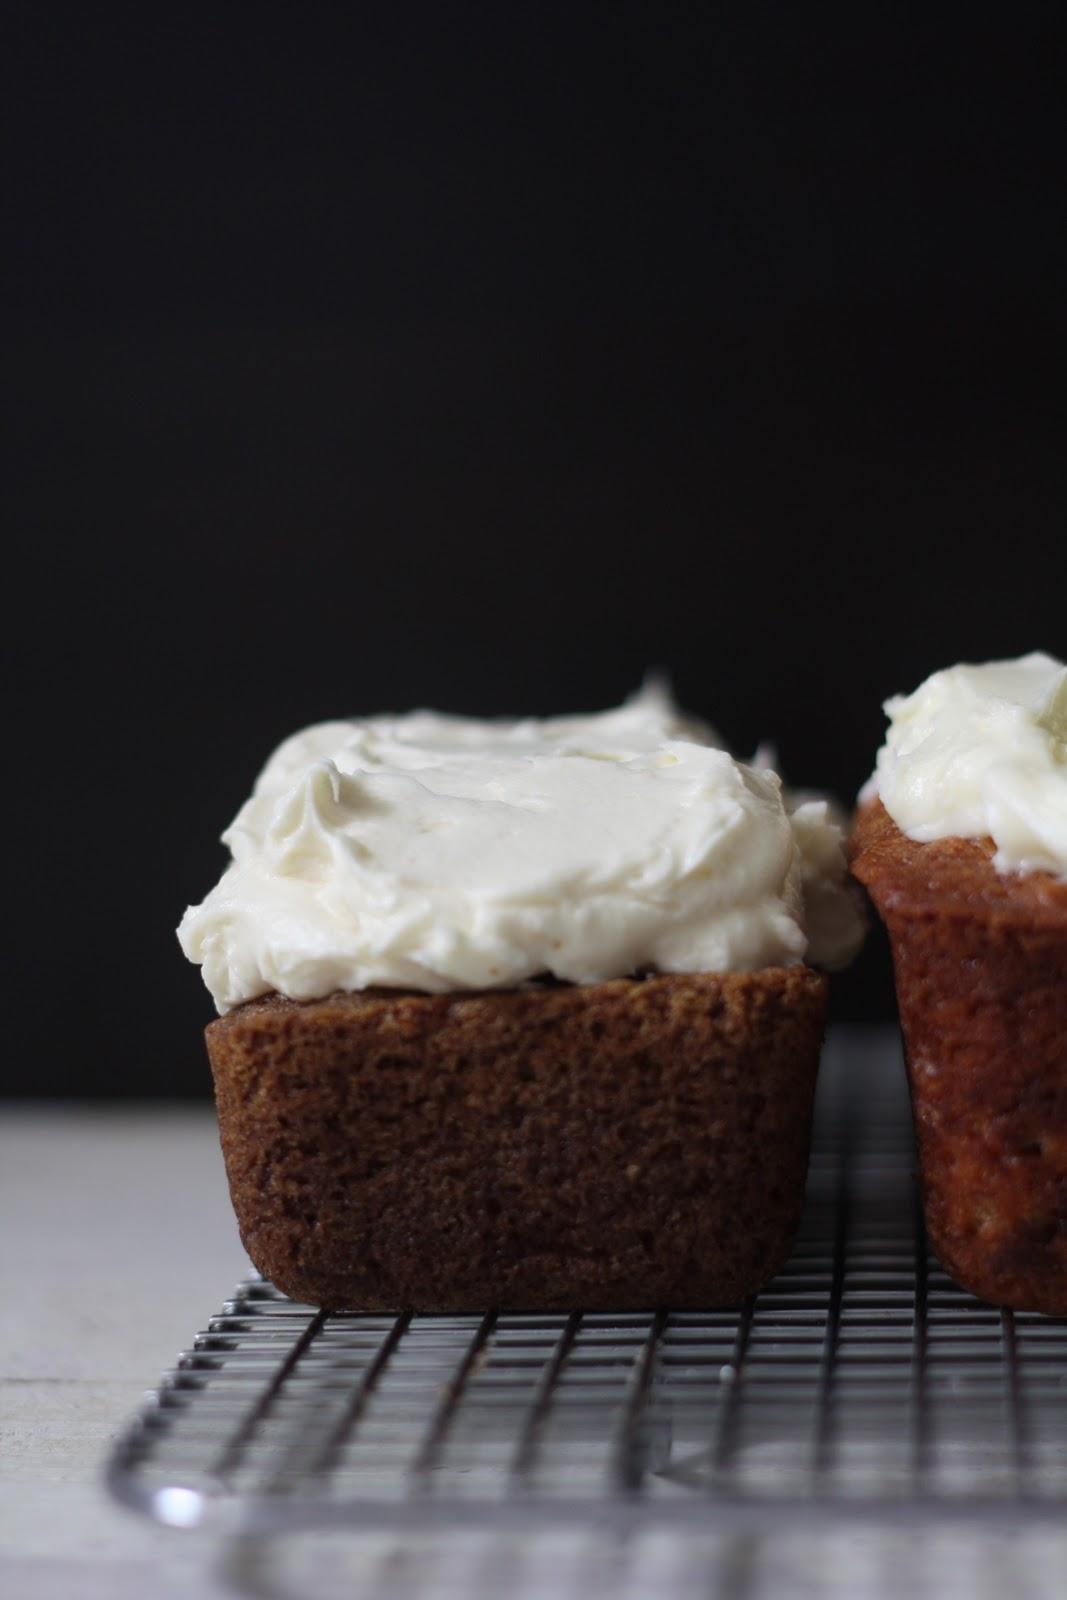 A Carrot Cake Comparison – alyssaskitchen.com